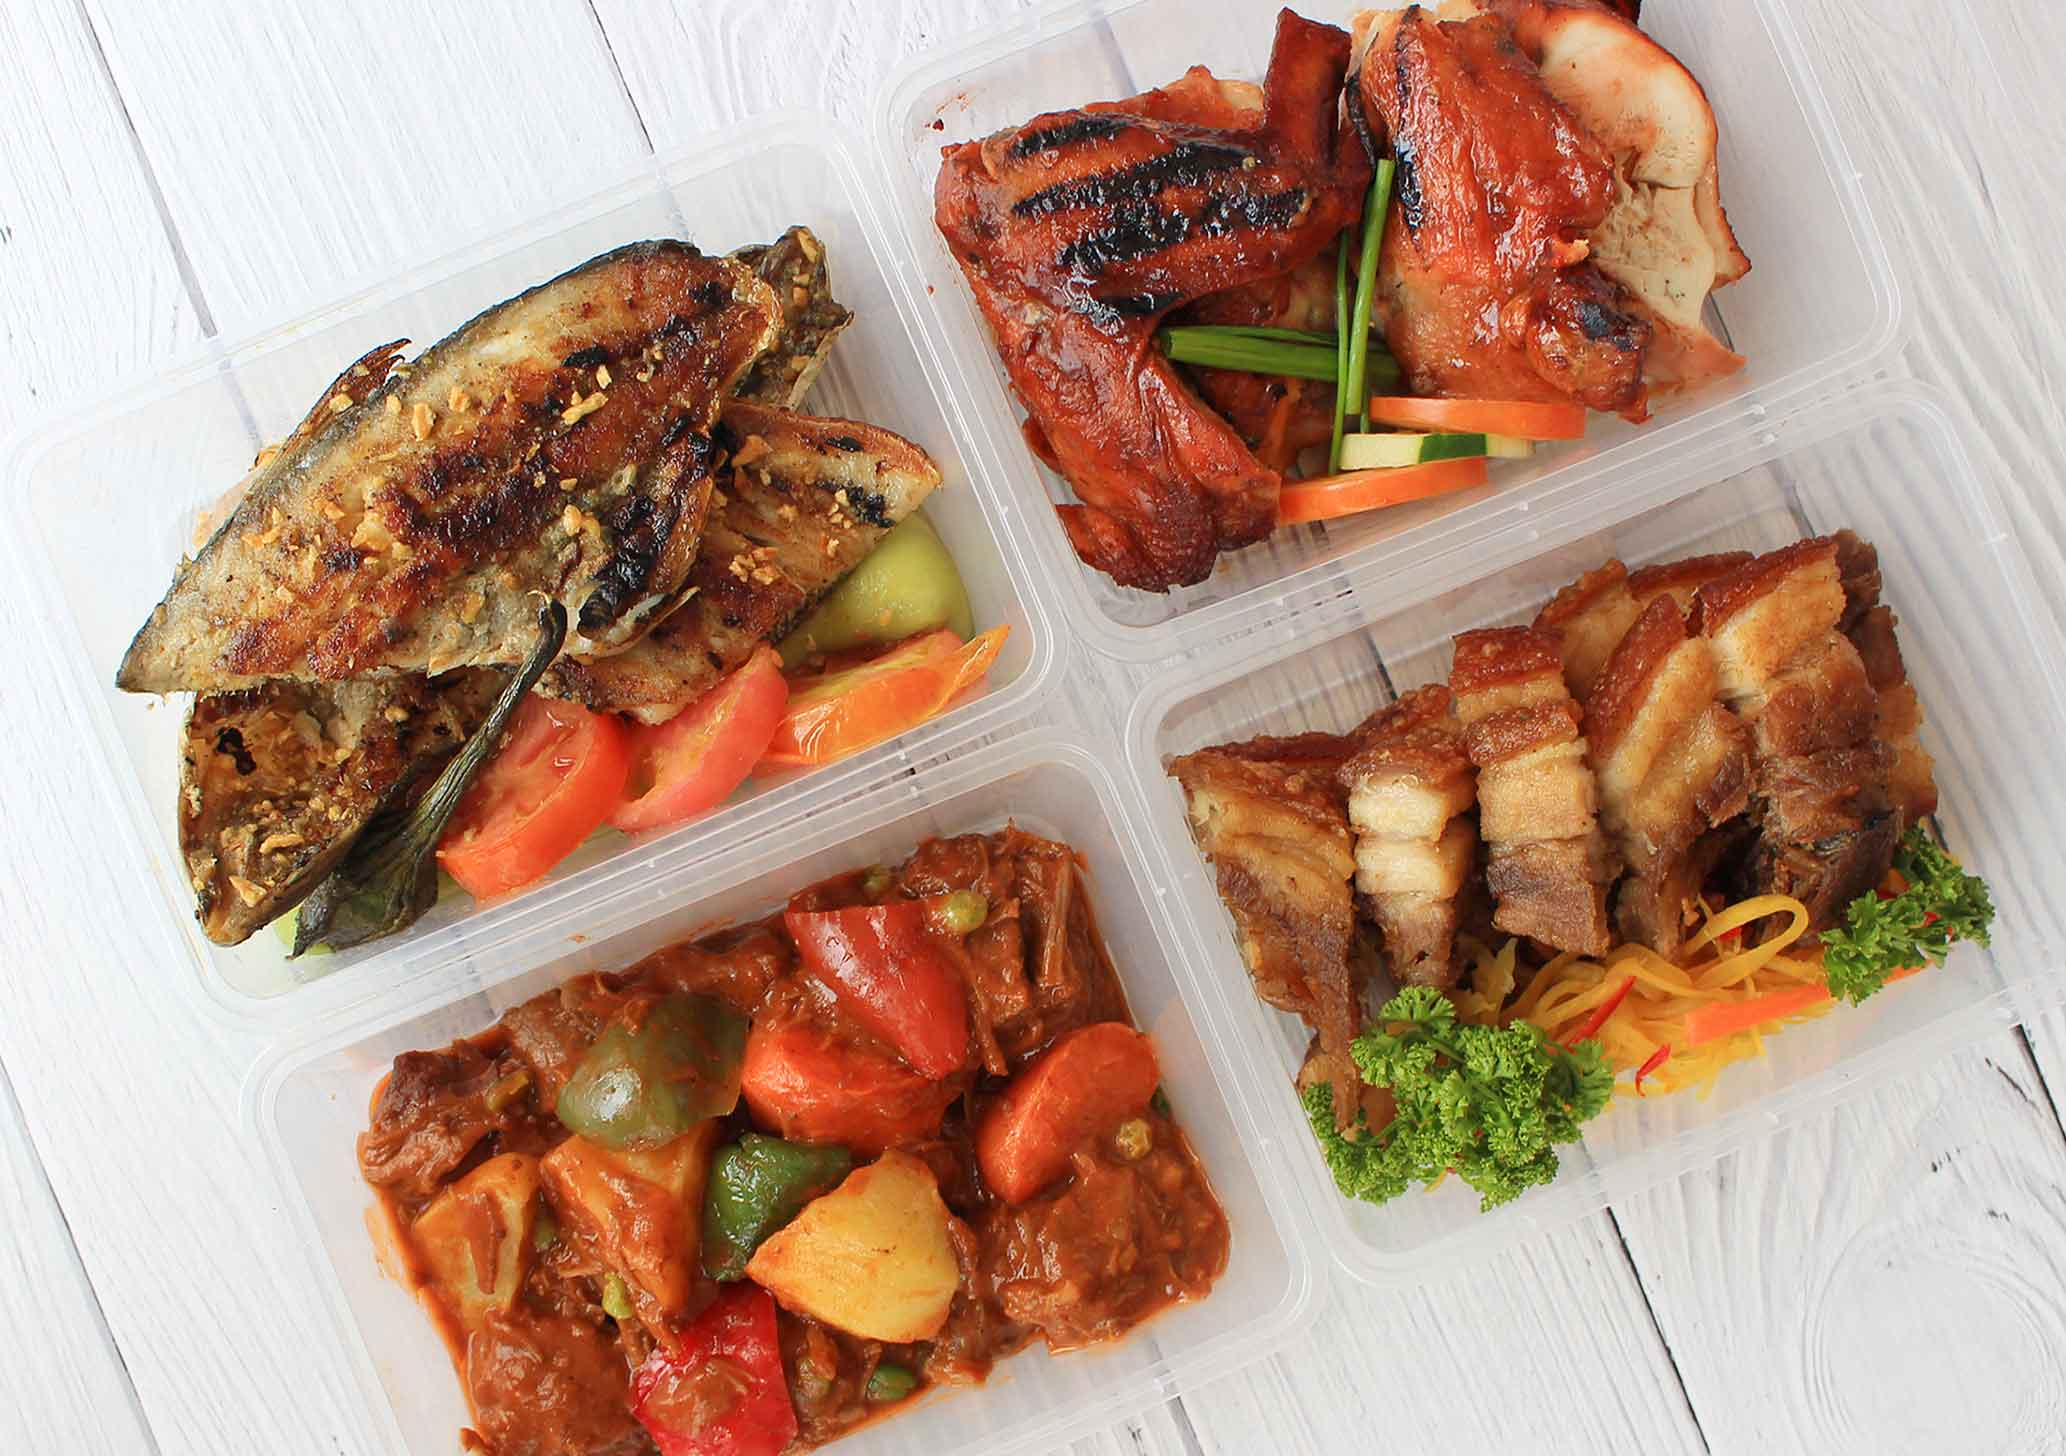 Kabayan Hotel Food To Go